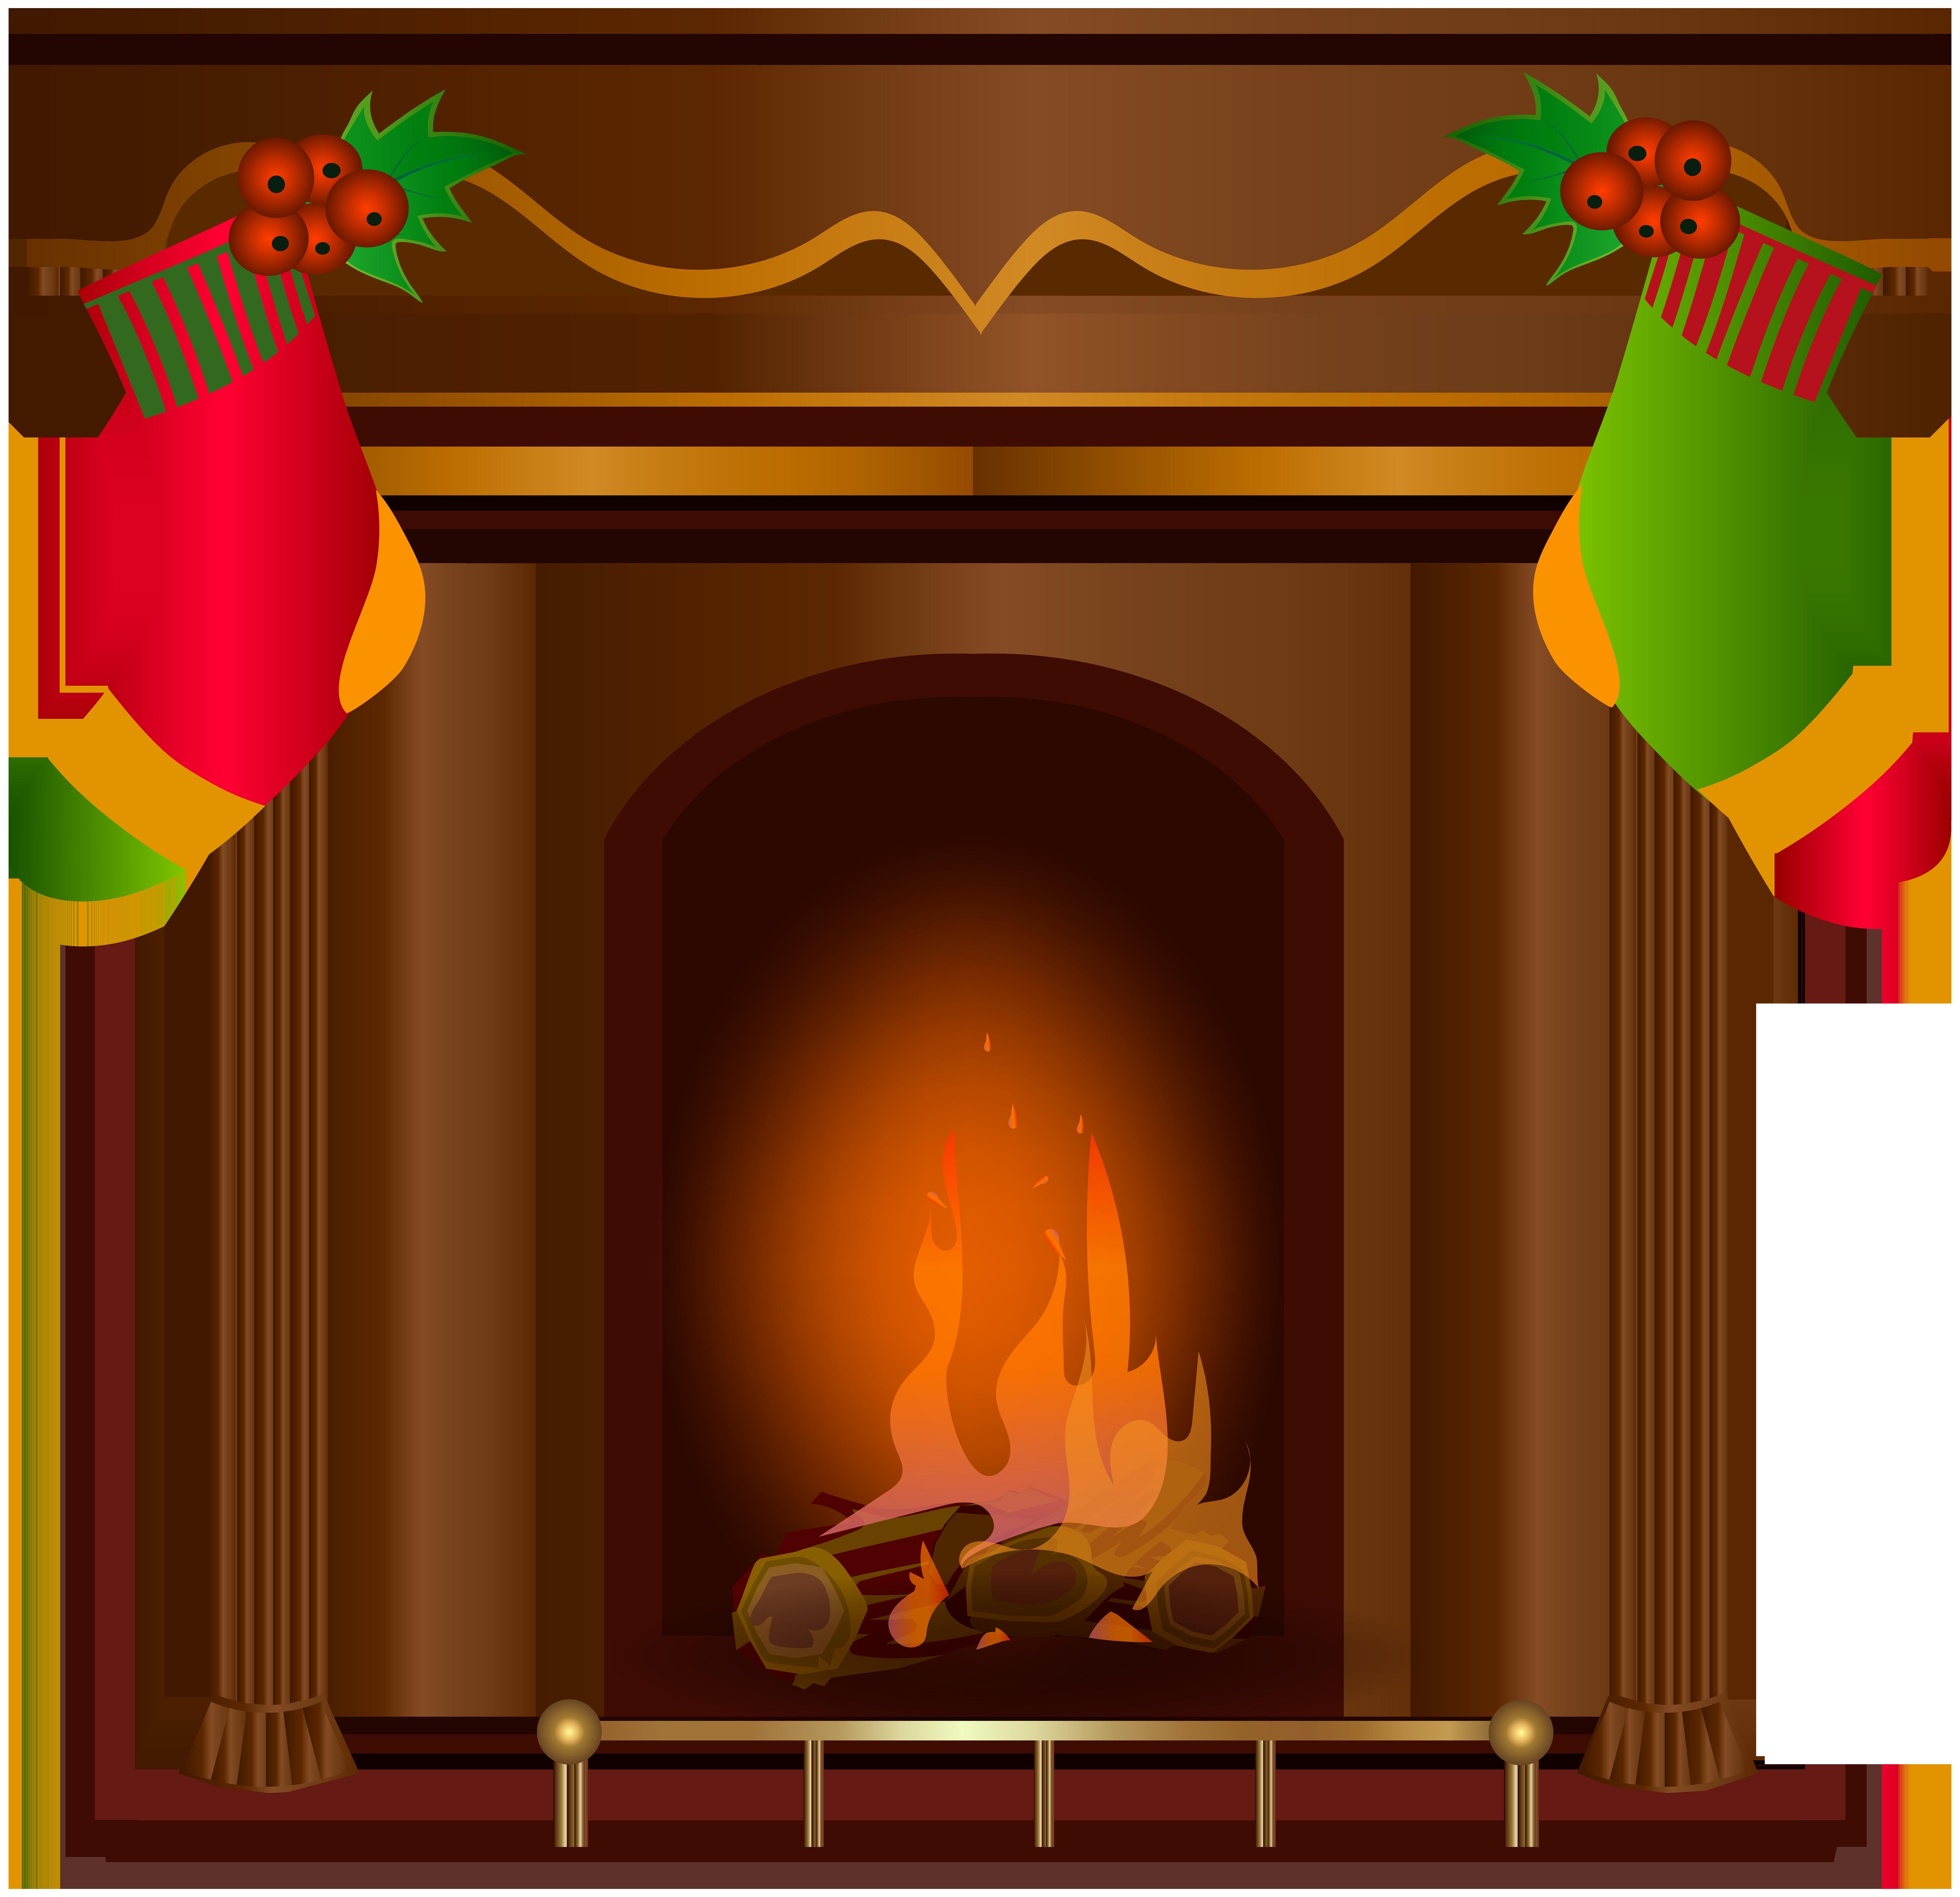 Christmas x clip art. Fireplace clipart transparent